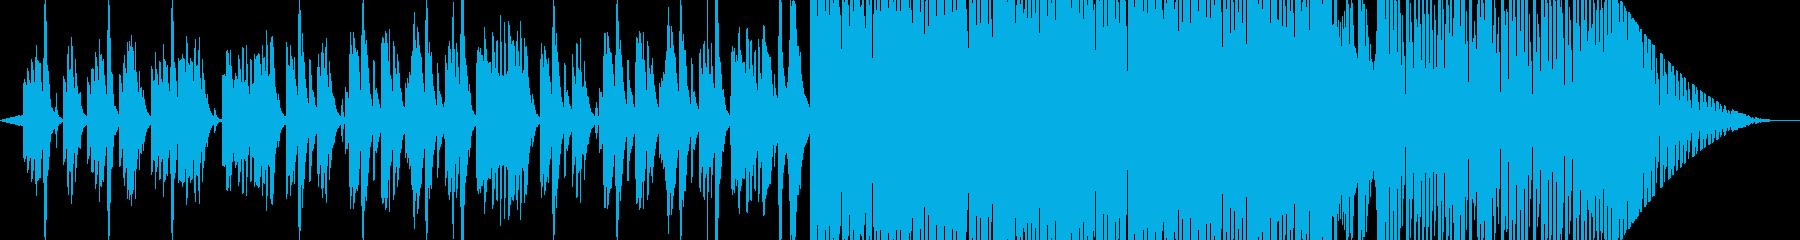 KEYにありそうな冬のオルゴールの再生済みの波形